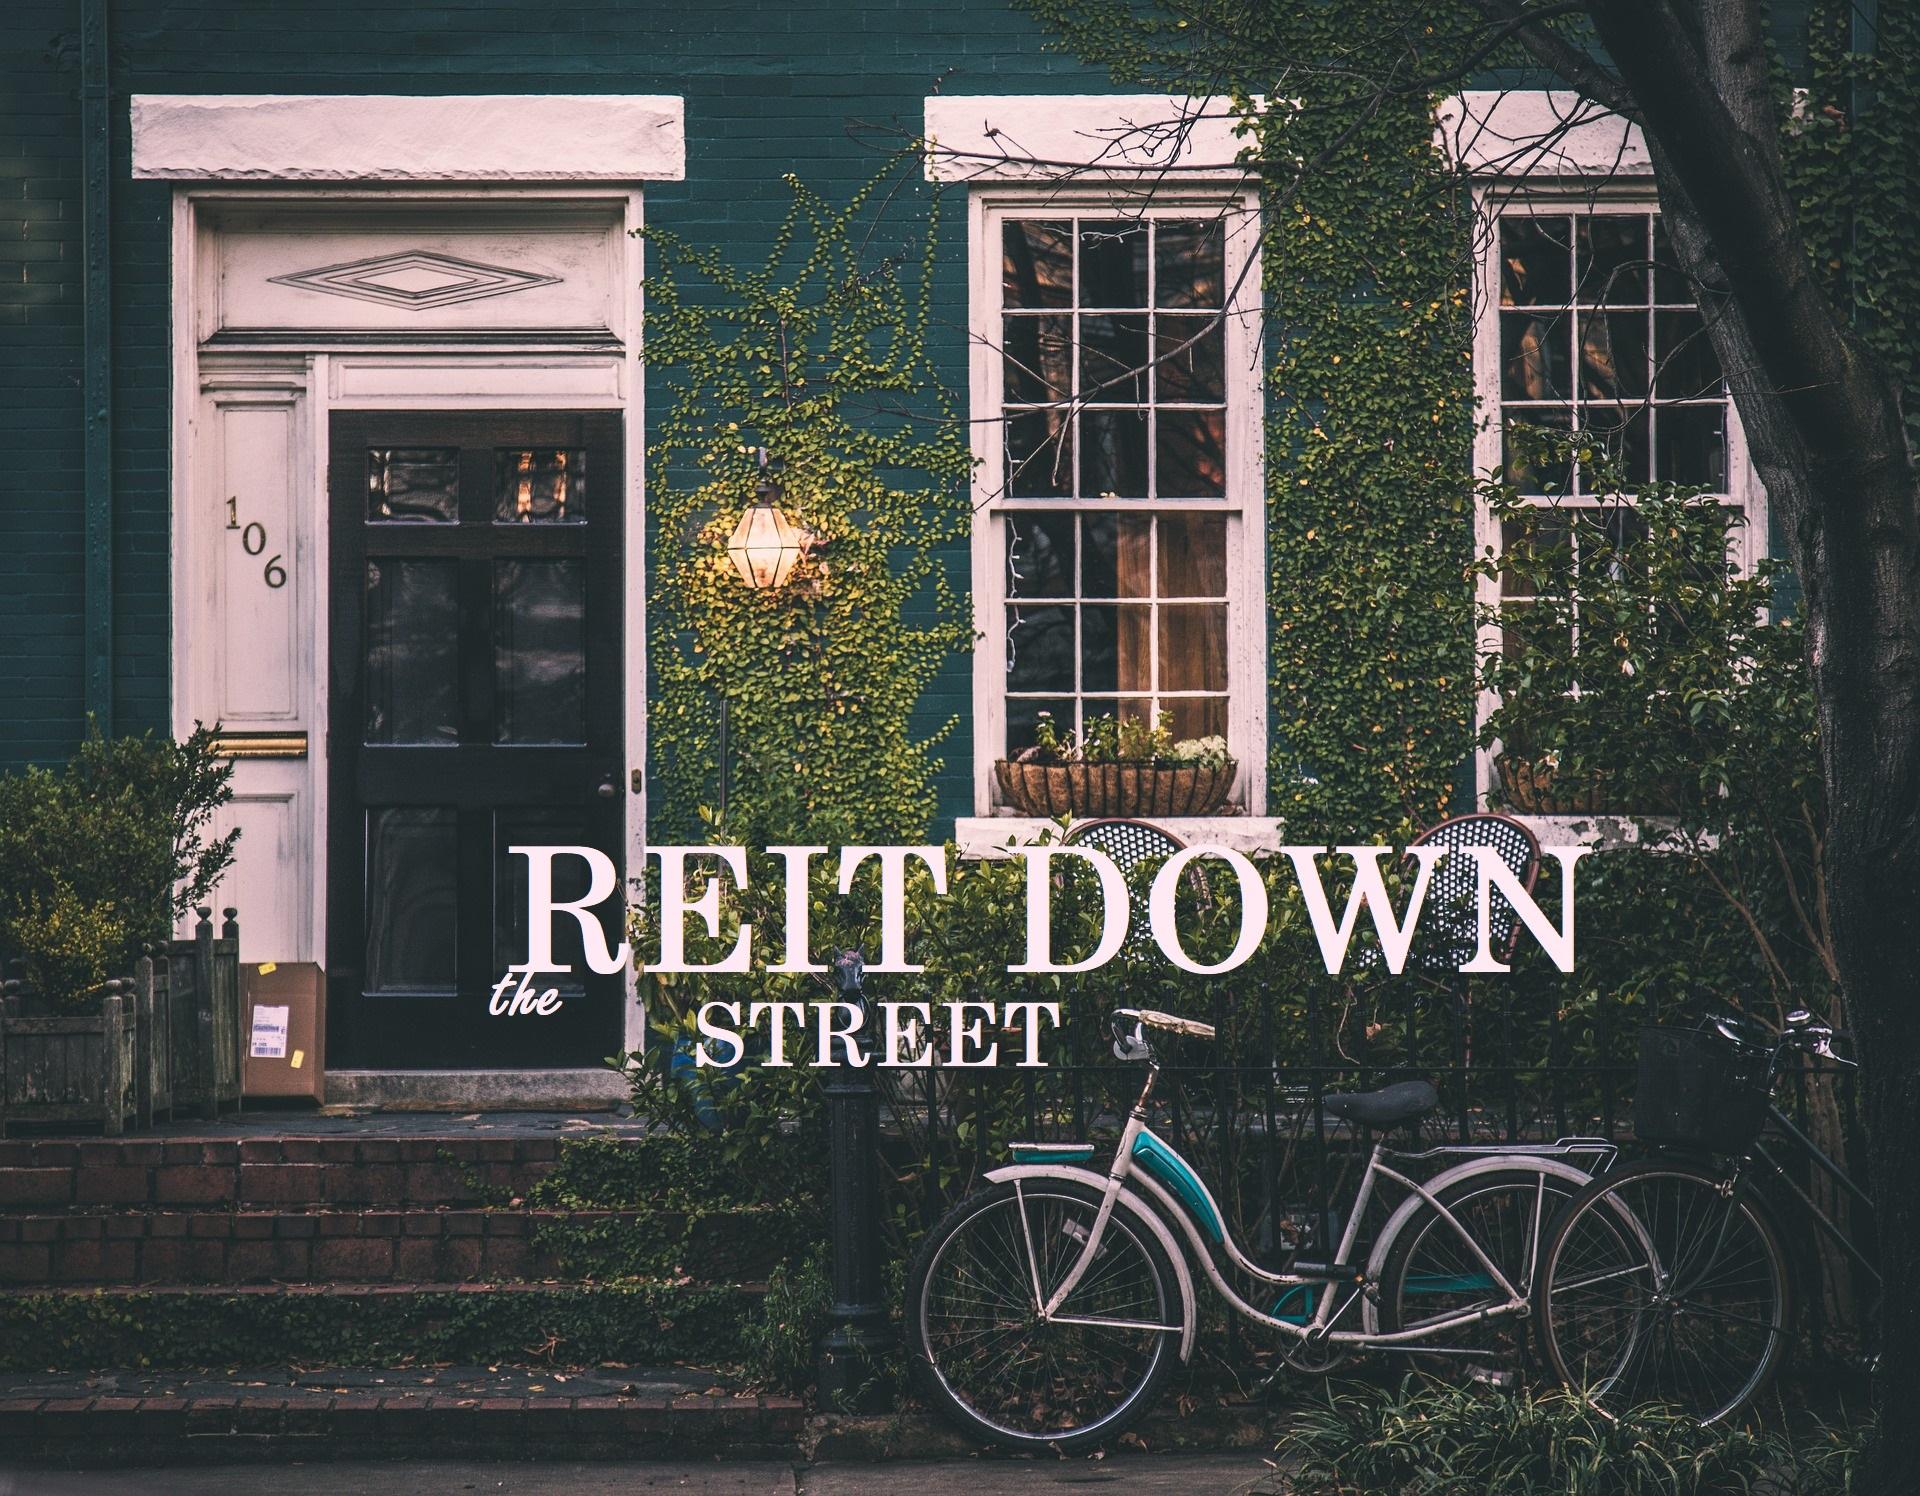 MFA REIT down the street